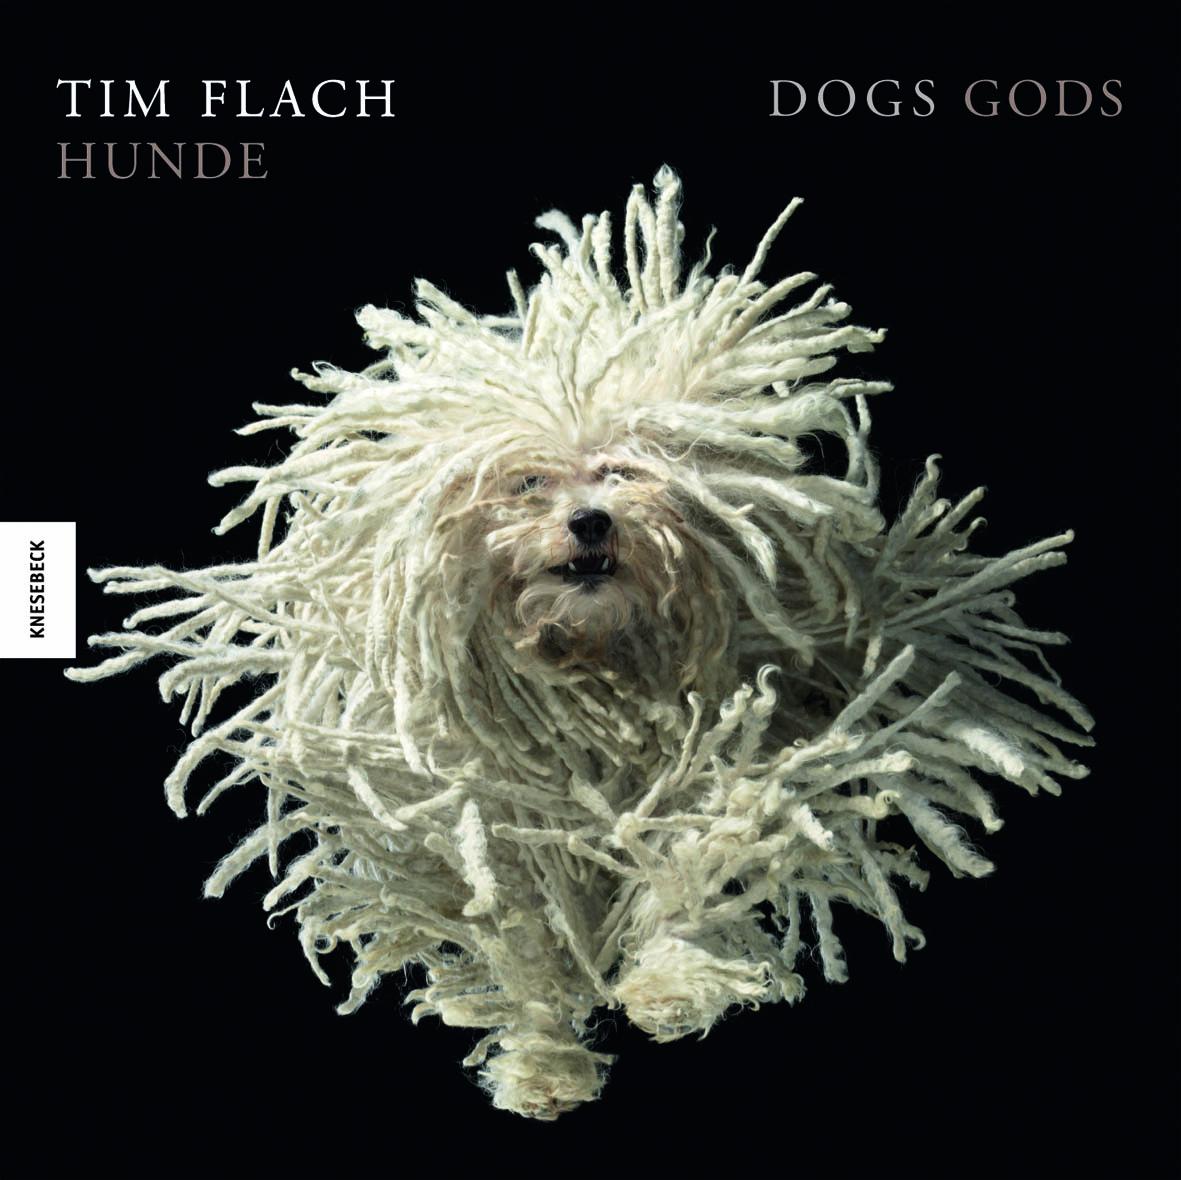 Tim Flach: Hunde